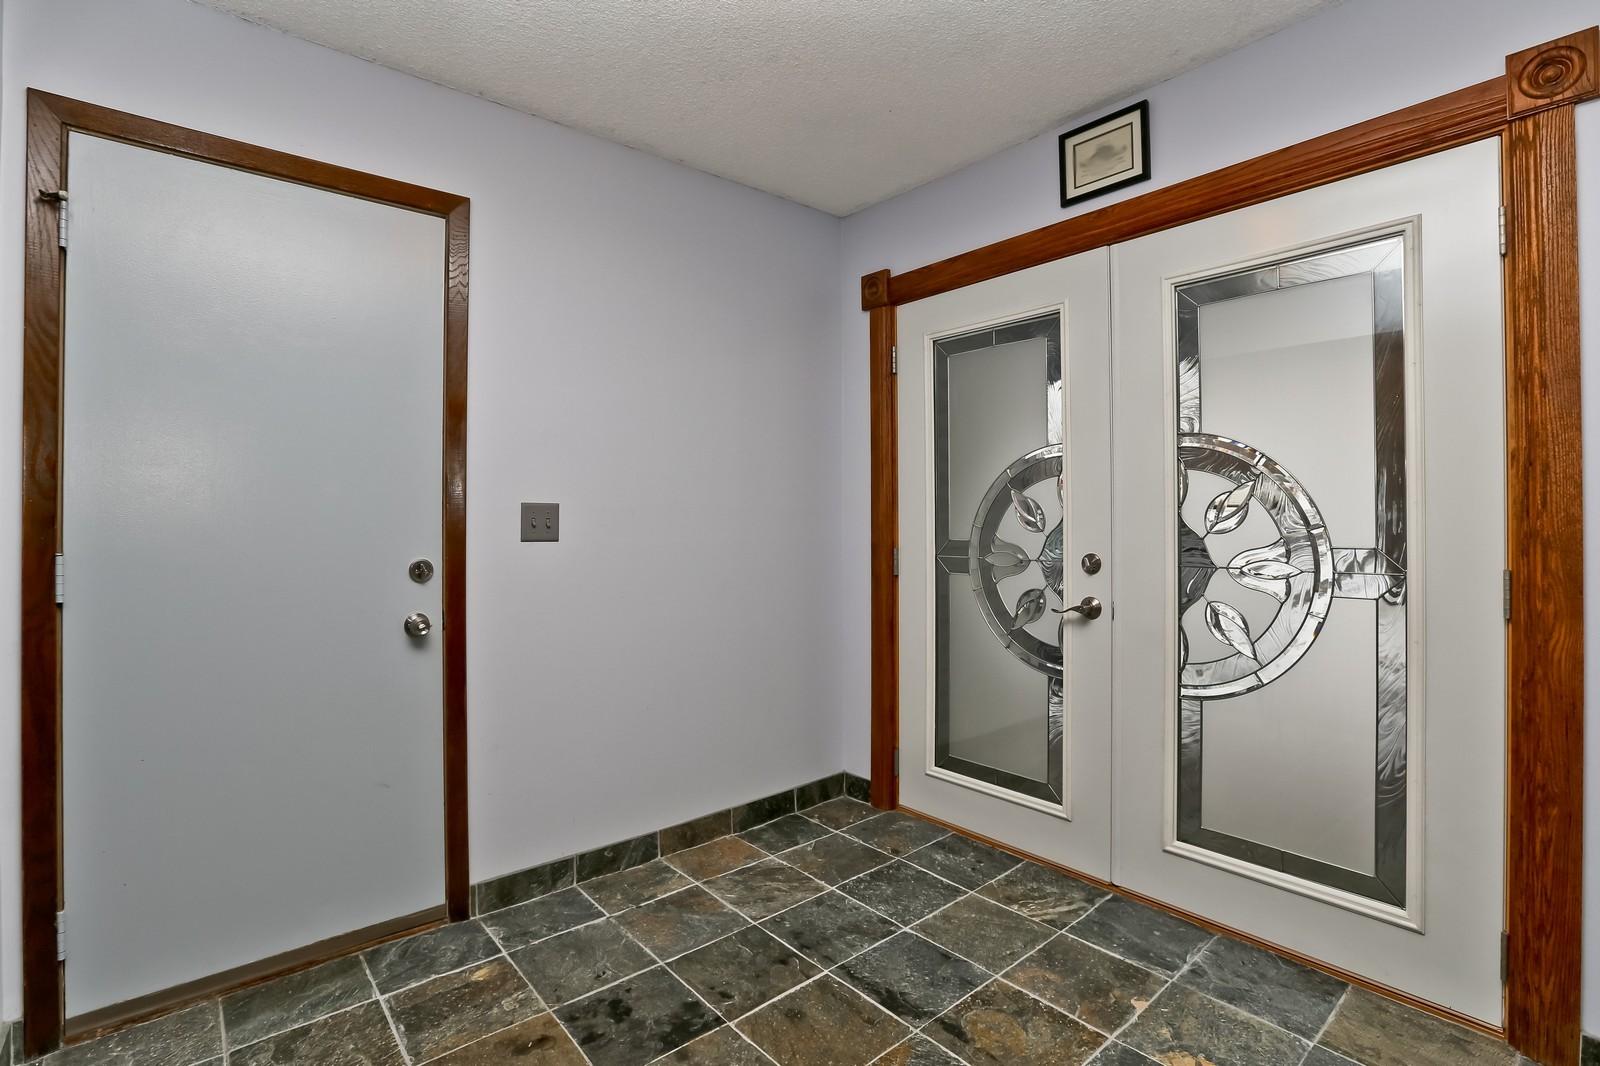 Real Estate Photography - 3250 Williams Lane, Minnetrista, MN, 55364 - Entryway